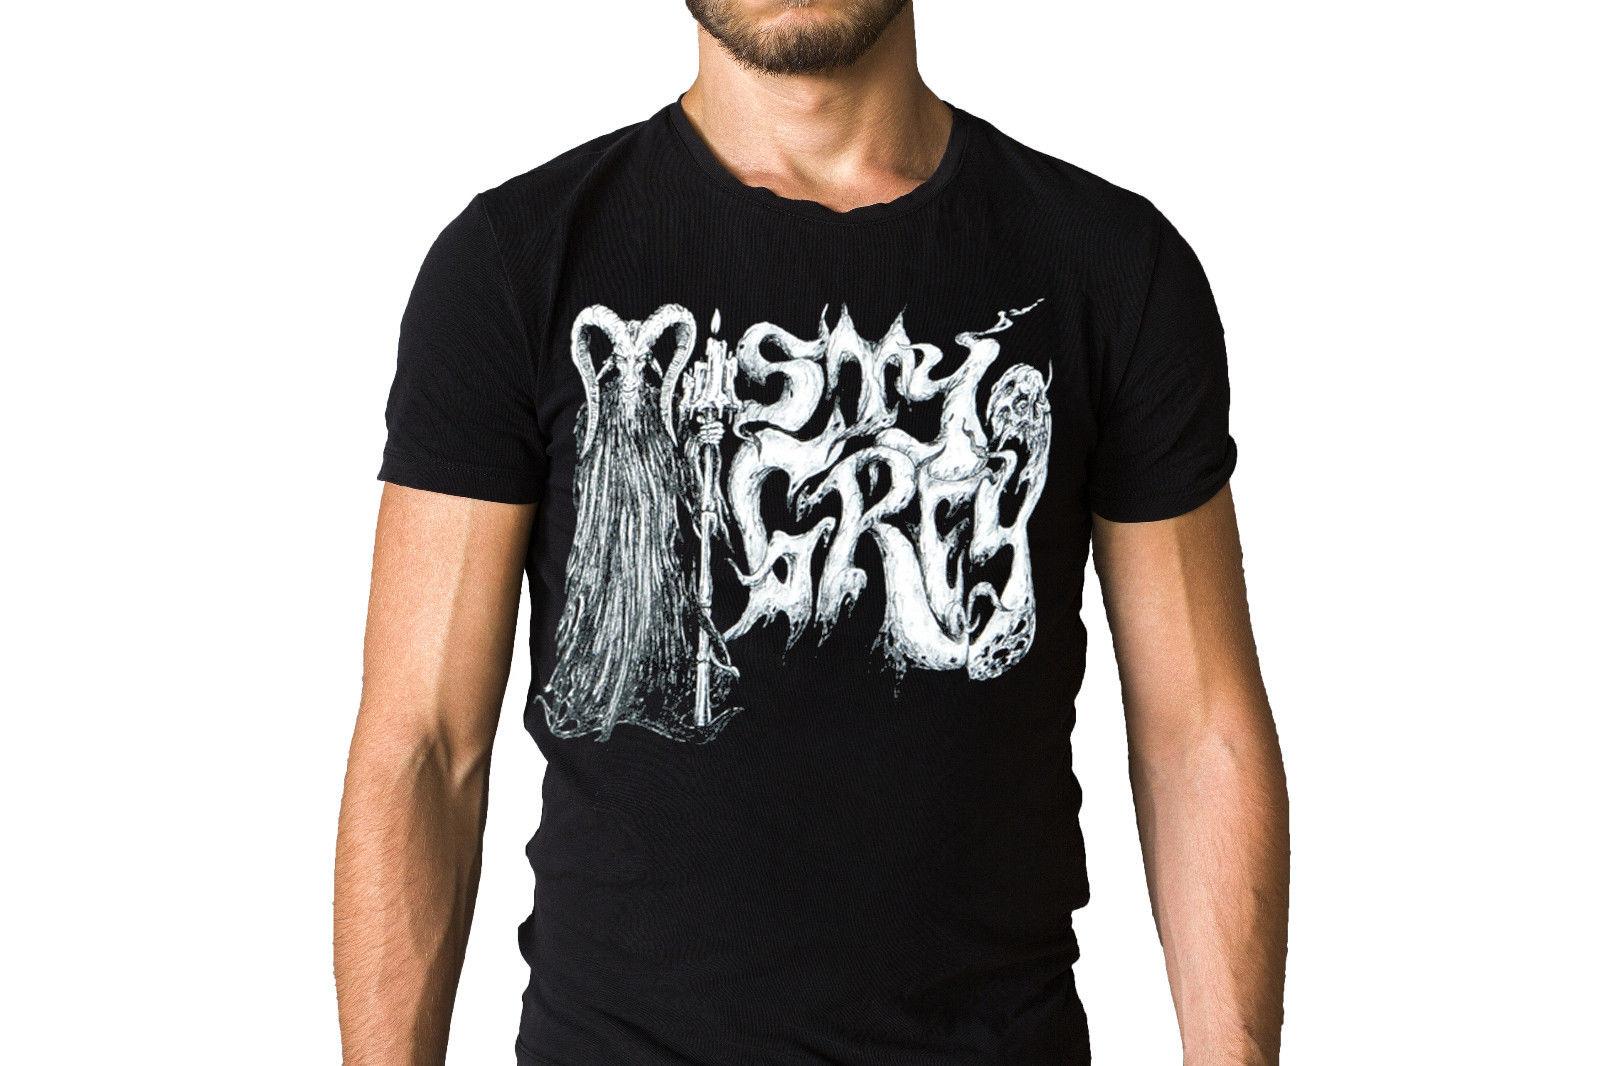 Misty Grey Group Freaks Of Doom Song Inspired T-Shirt